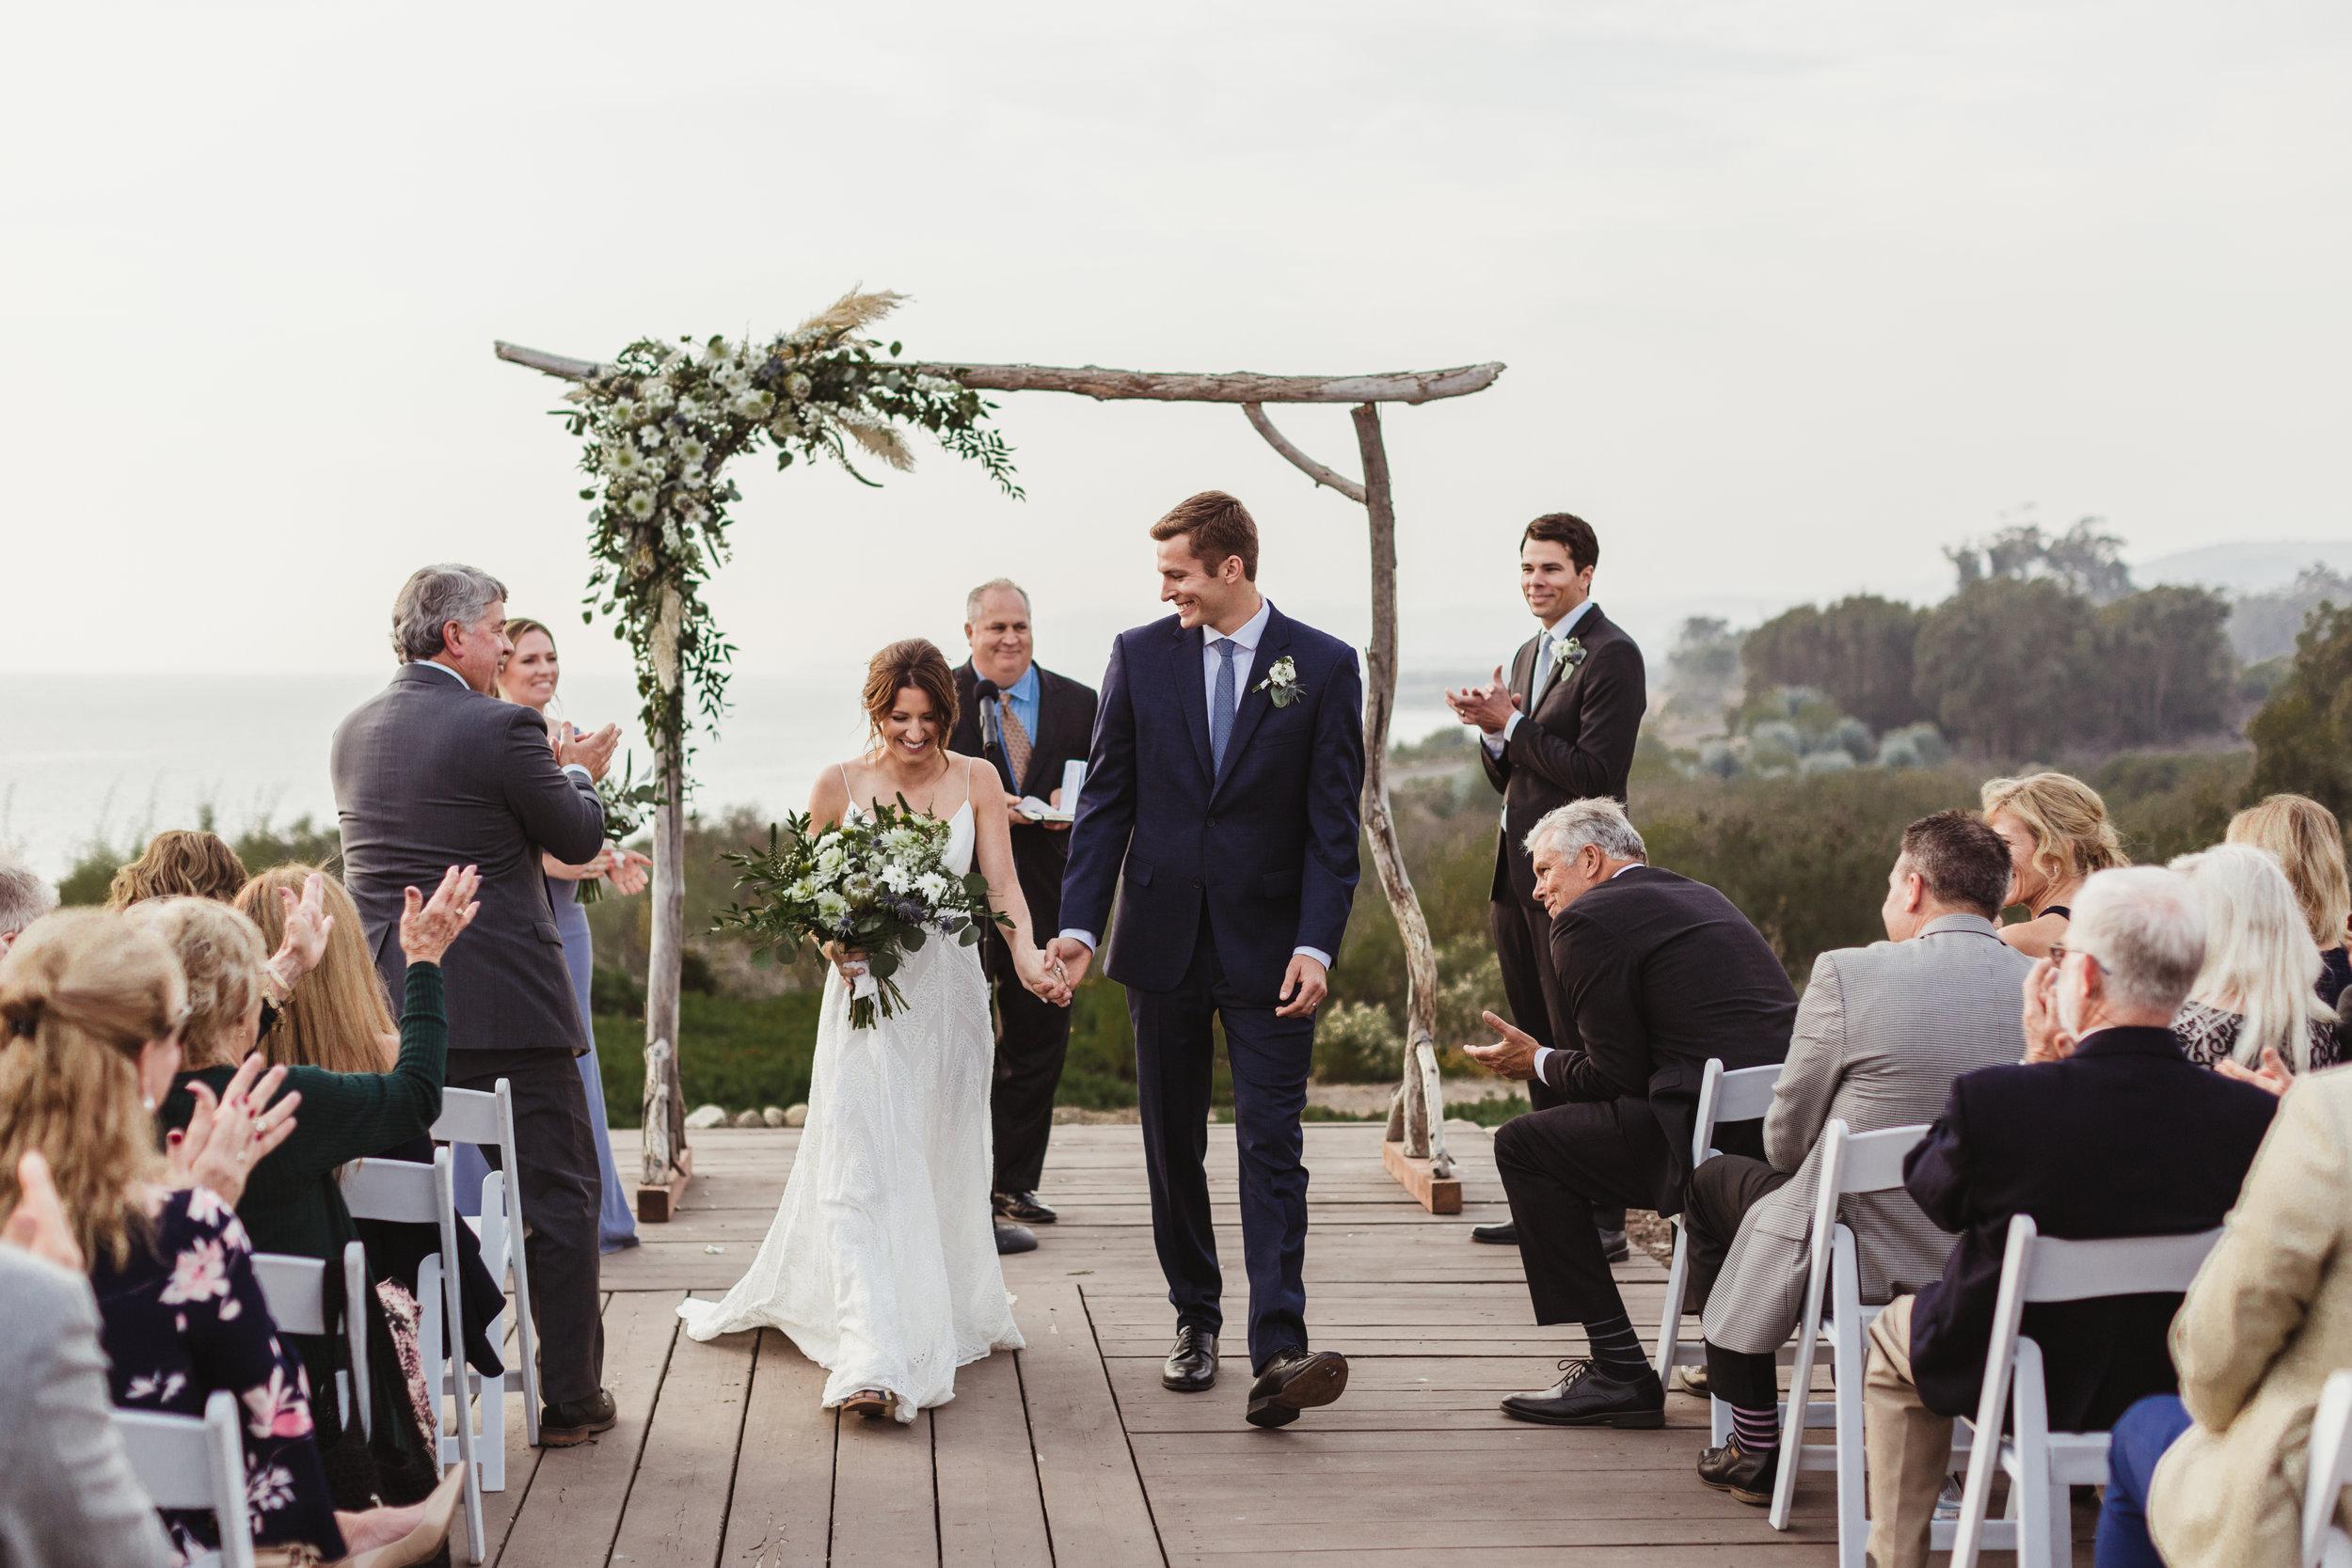 Jamie_English_Photography_JordanErik_Dos_Pueblos_Orchid_Wedding_Santa_Barbara_Fall2018-515.jpg